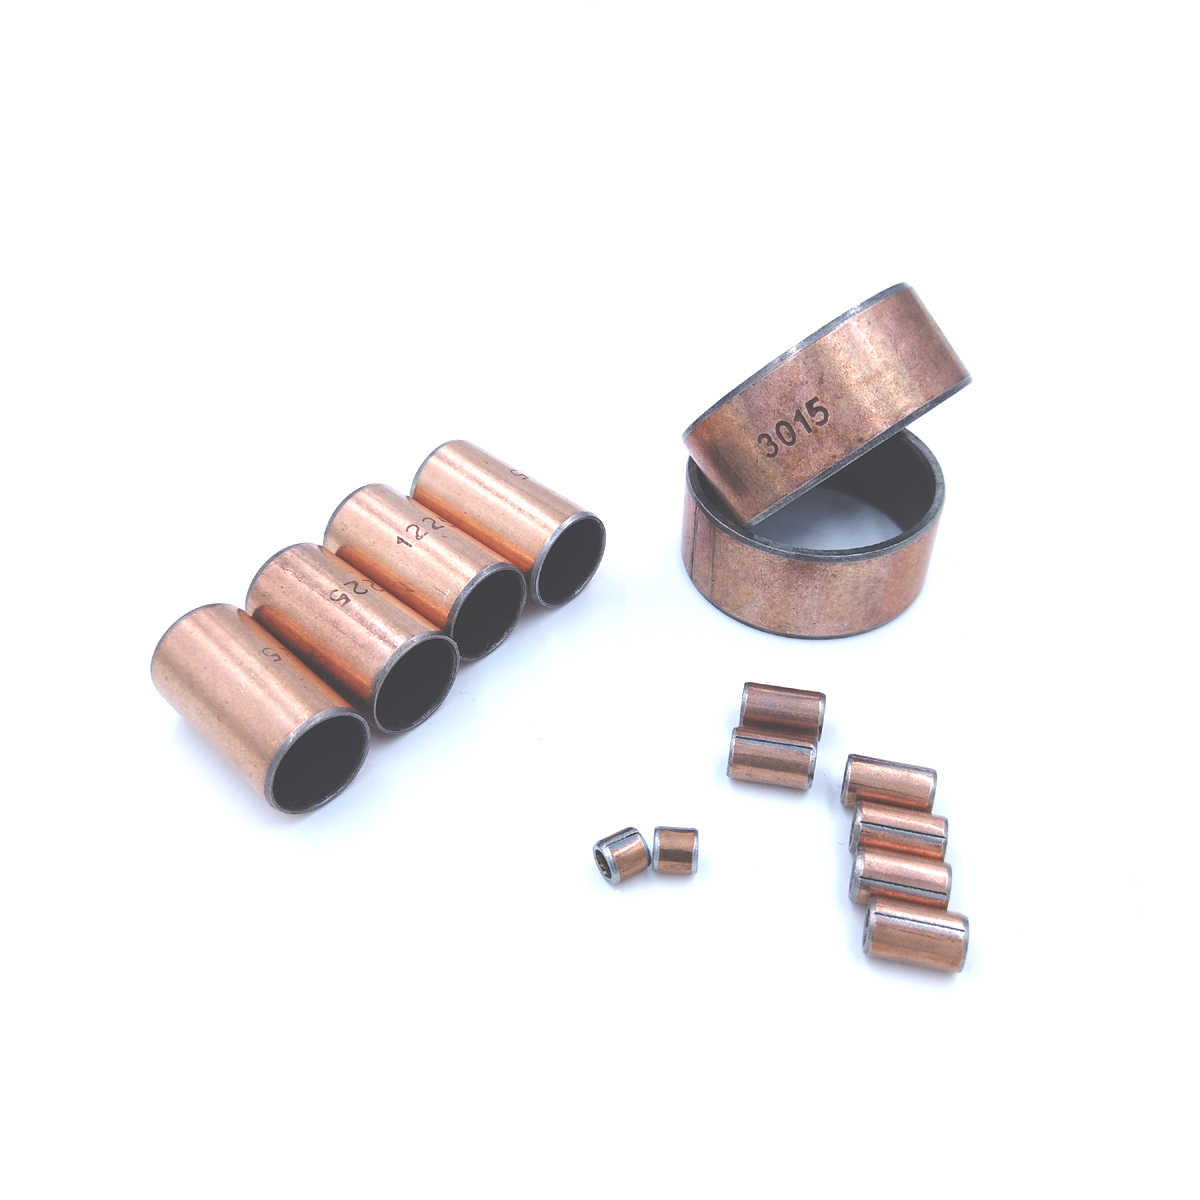 5pcs SF-1 3040 Self Lubricating Composite Bearing Bushing Sleeve 30*34*40mm